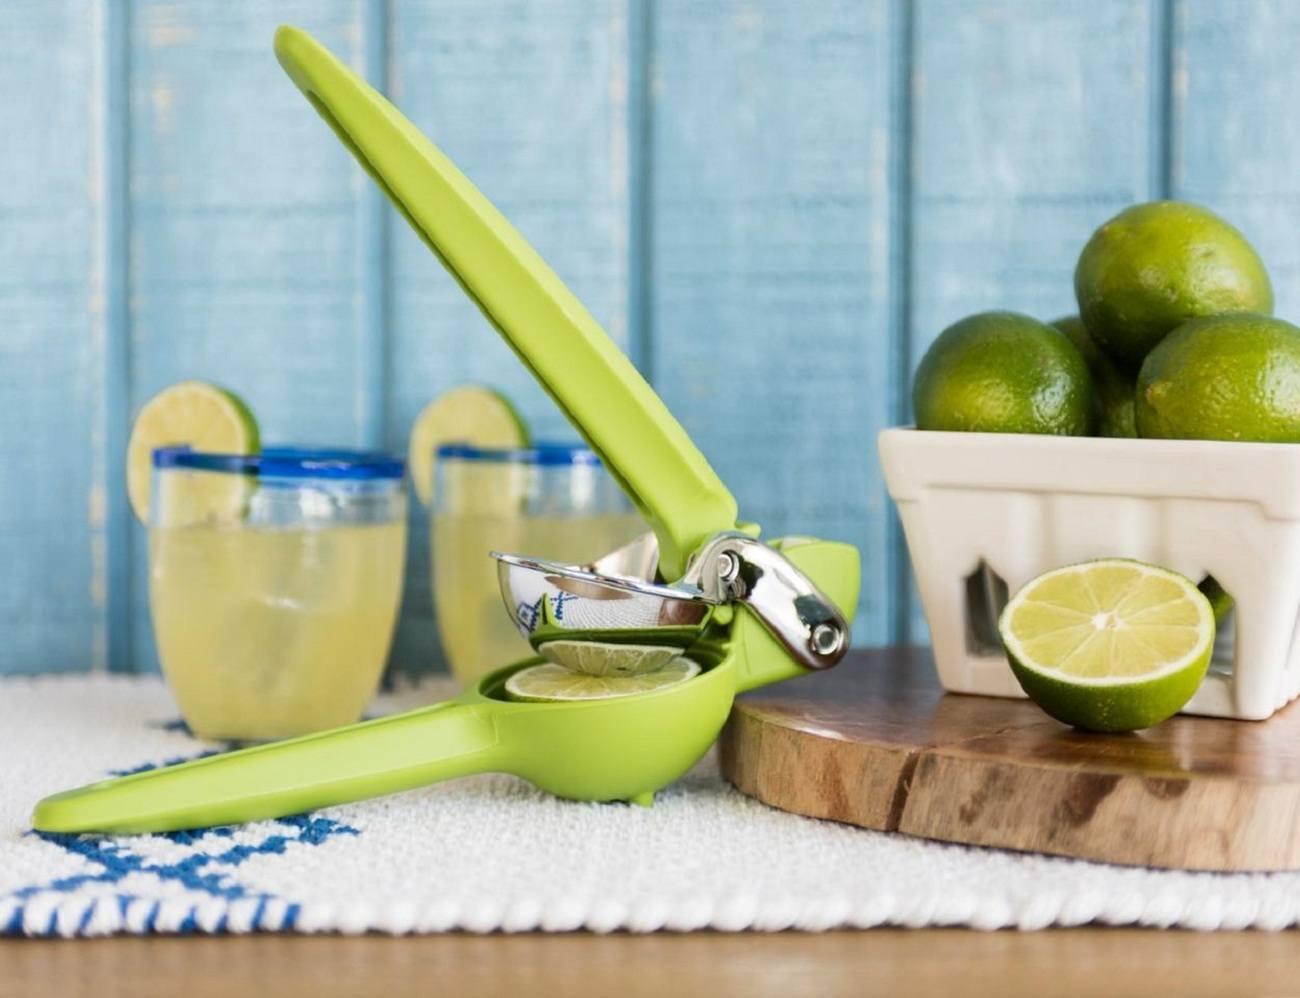 Chefn Citrus Juicer